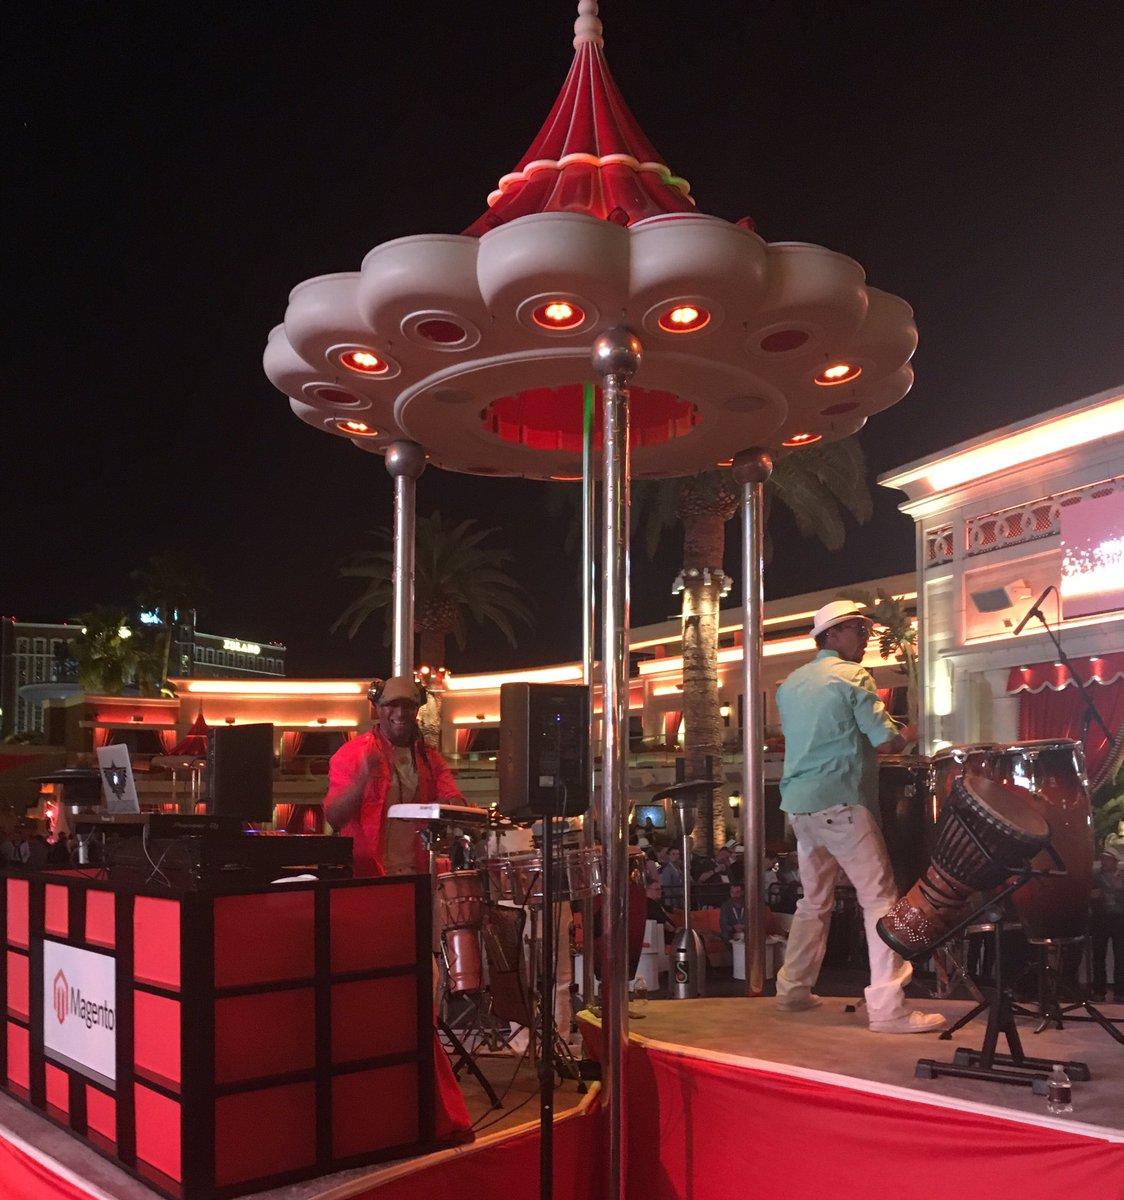 magento: The festivities have begun at the Legendary Imagine Evening Event at the Encore Beach Club. #MagentoImagine https://t.co/fFye0Osviu